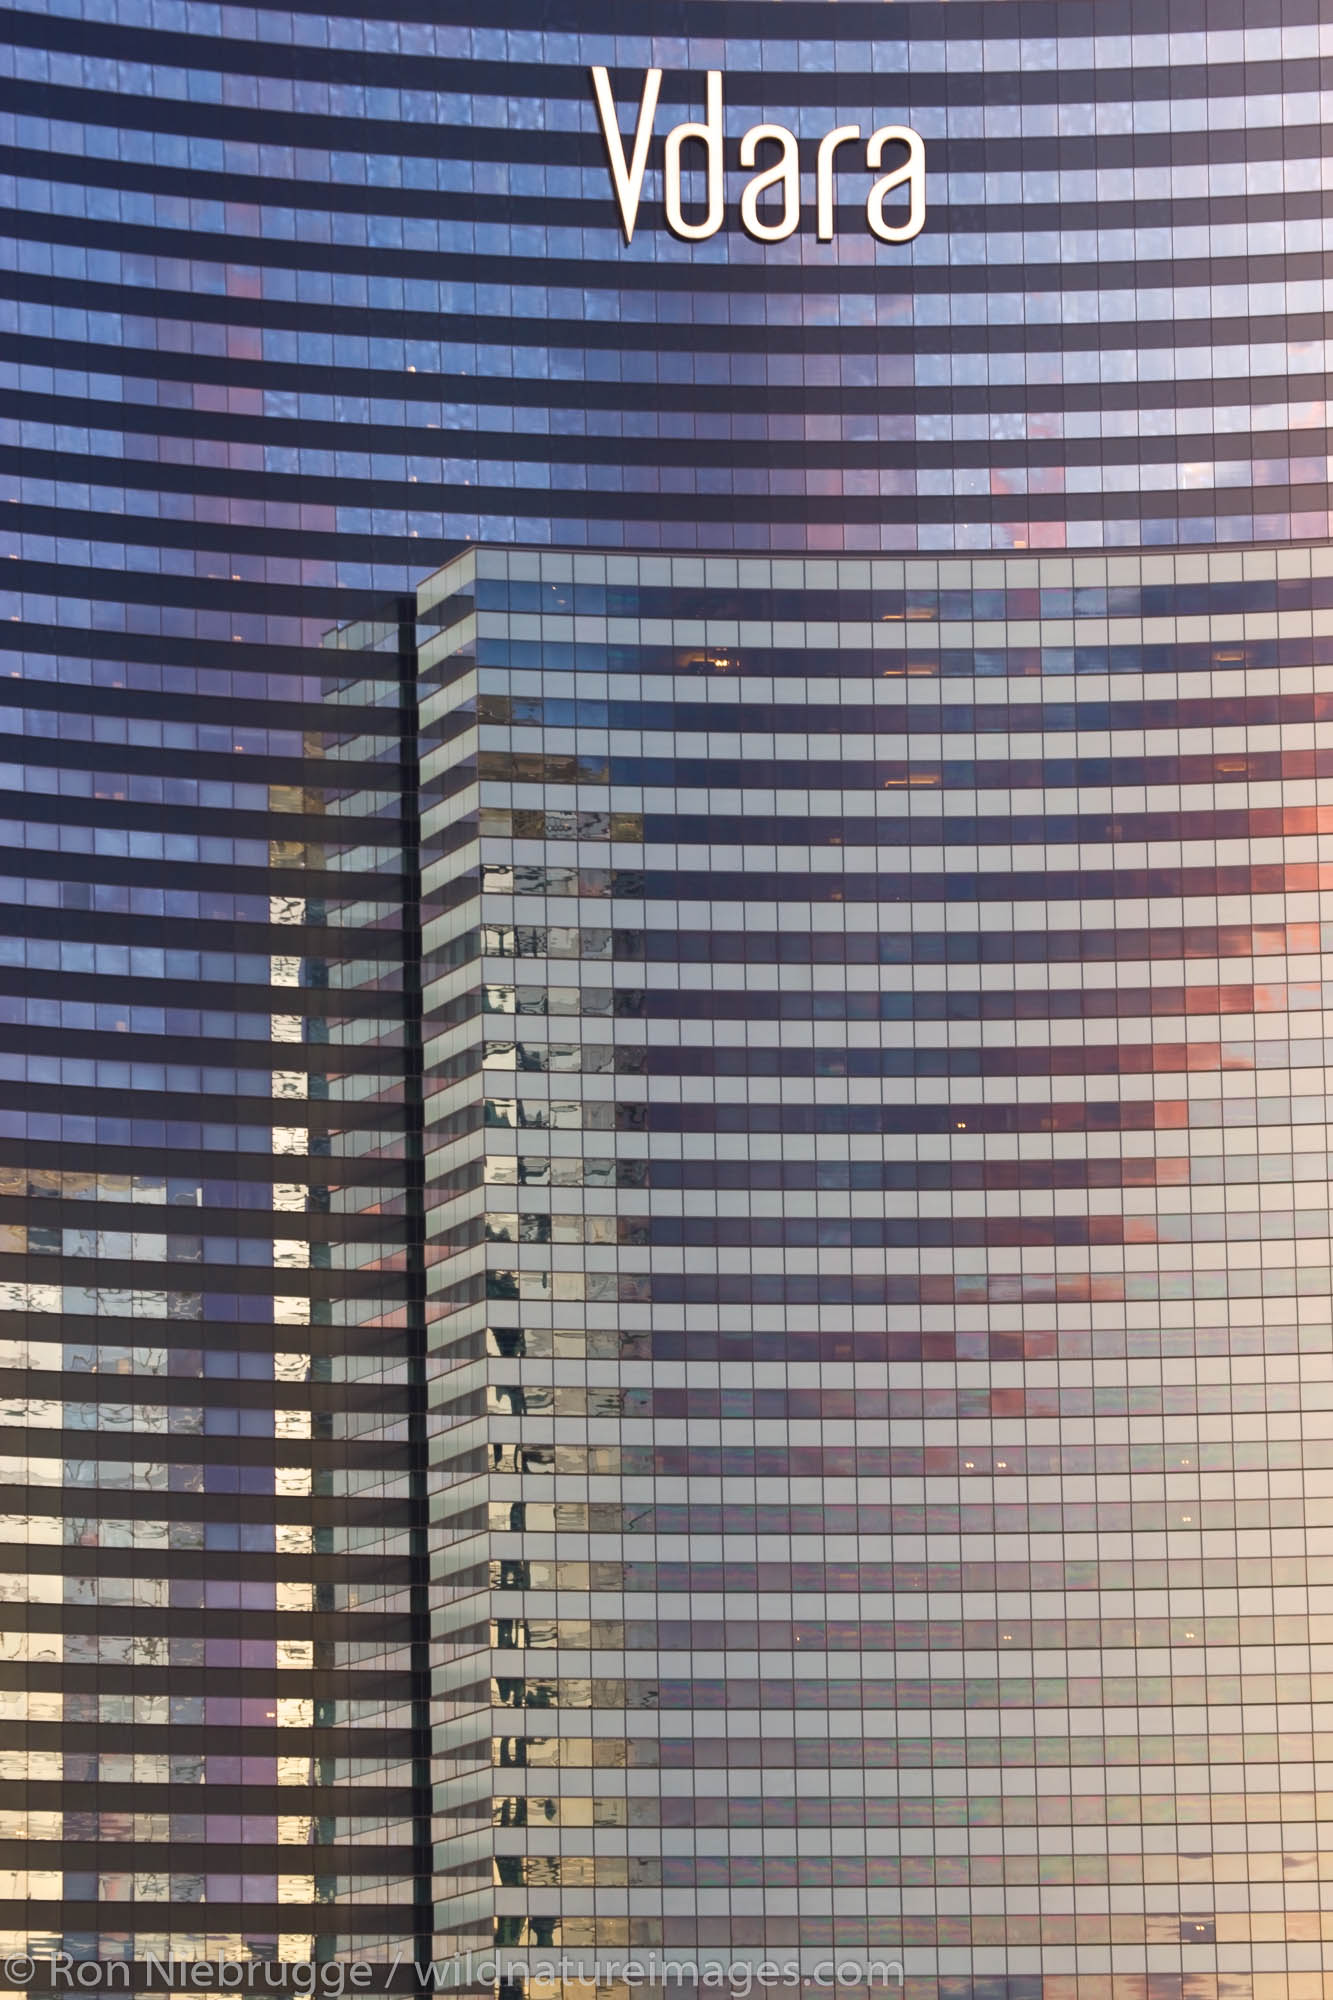 Vdara Hotel and Spa, City Center, Las Vegas, Nevada.